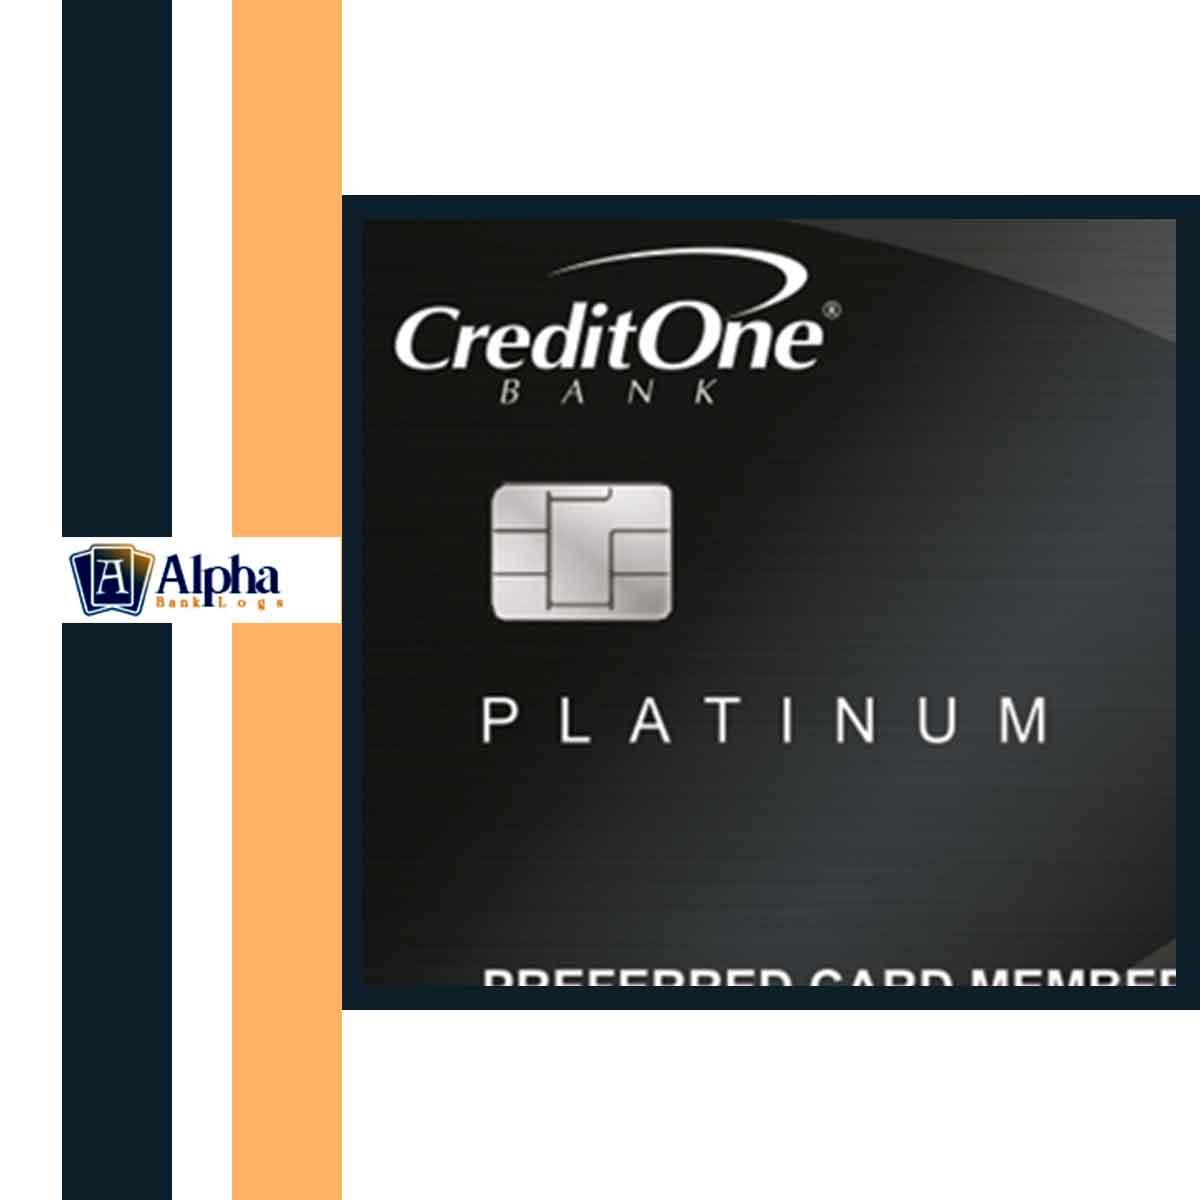 Creditonebank.com BANK LOGIN with 3,000-5,000 $ Balance + CASHOUT TUTORIAL IN MONERO